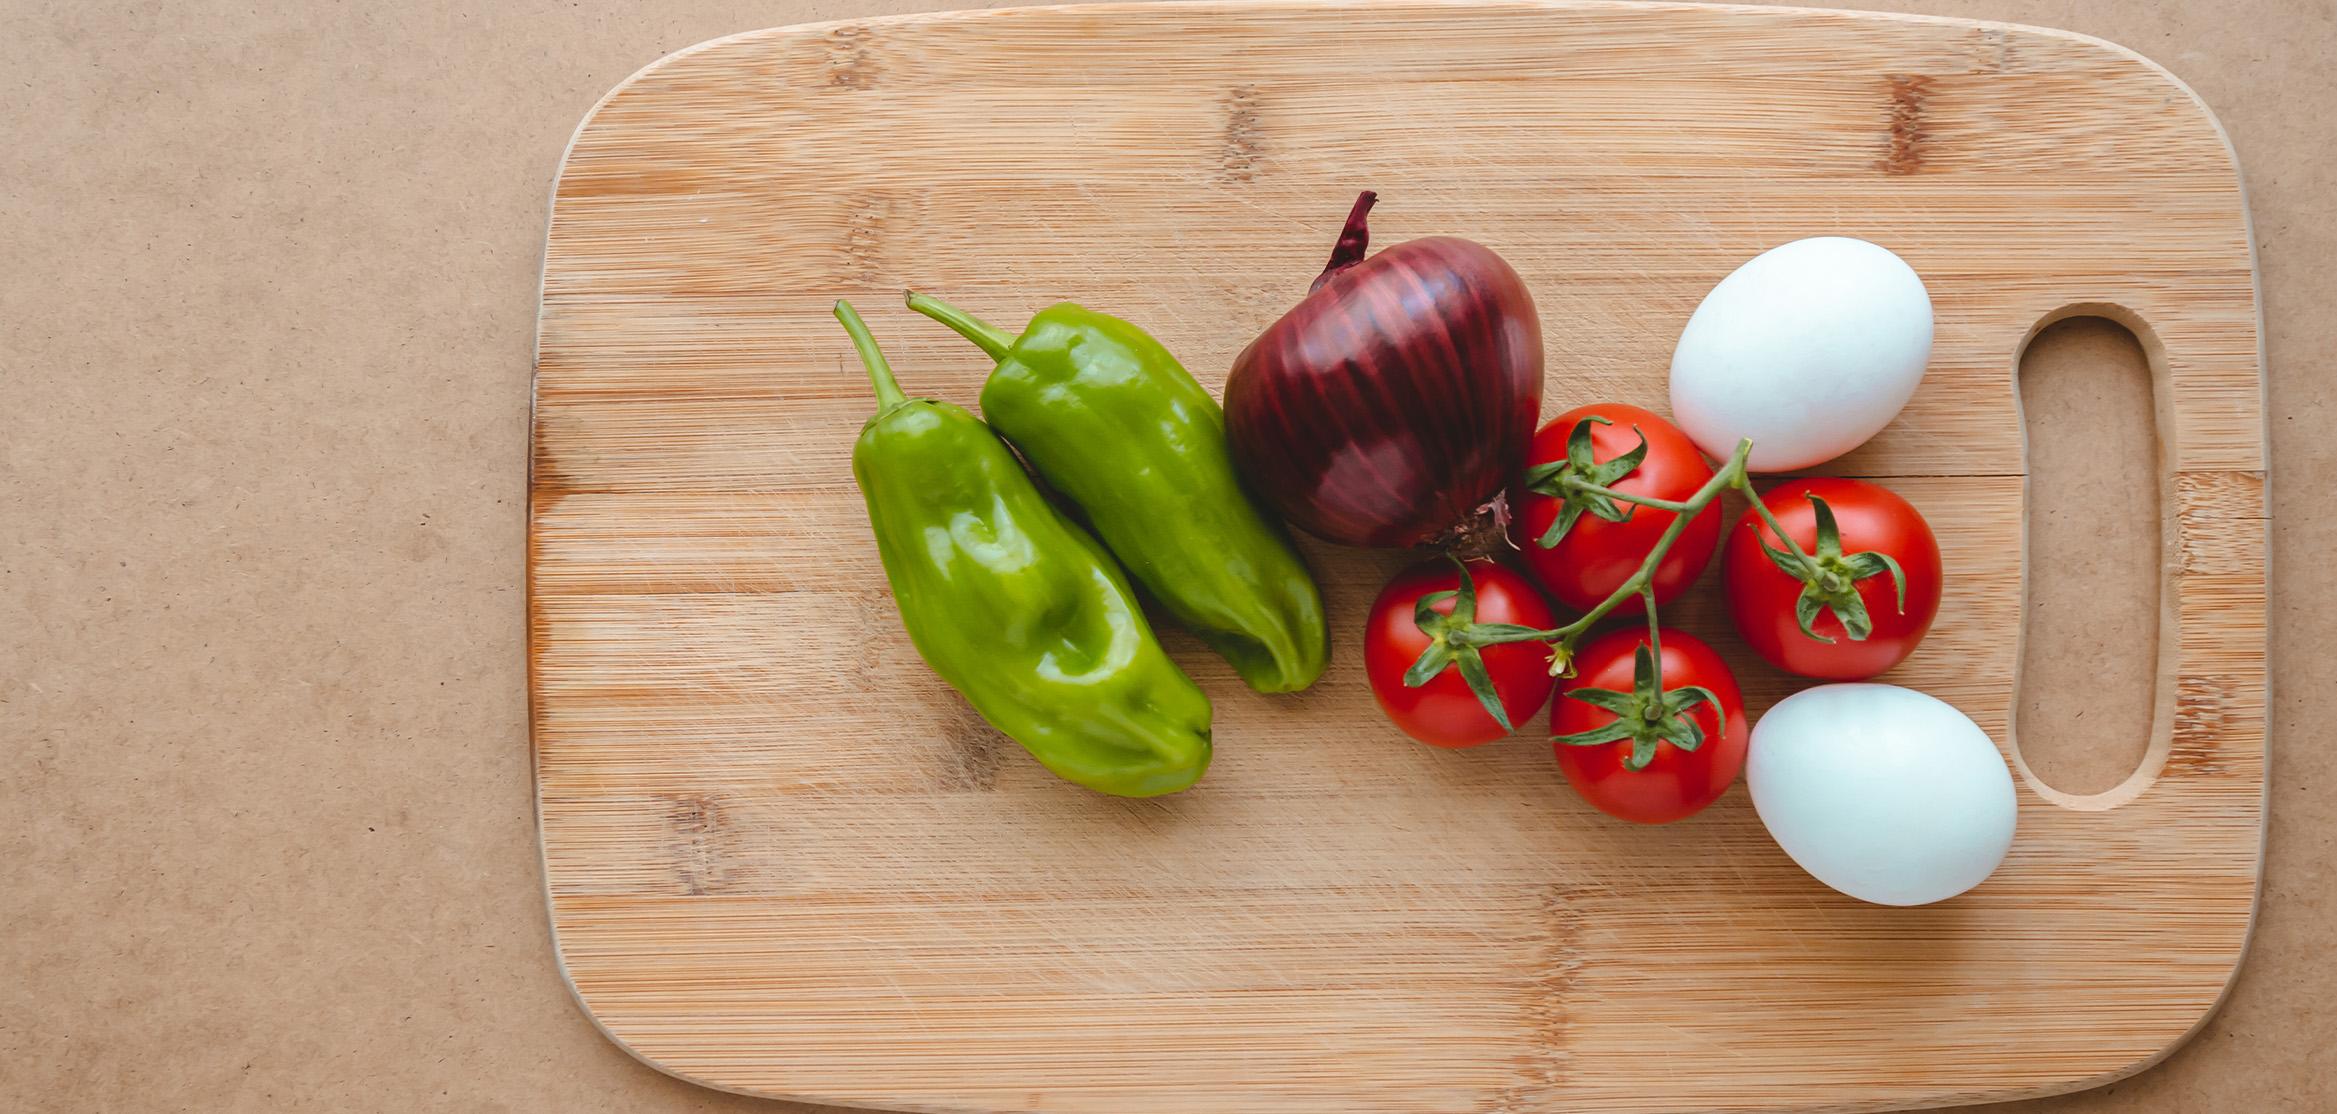 Additional Ingredients to Menemen